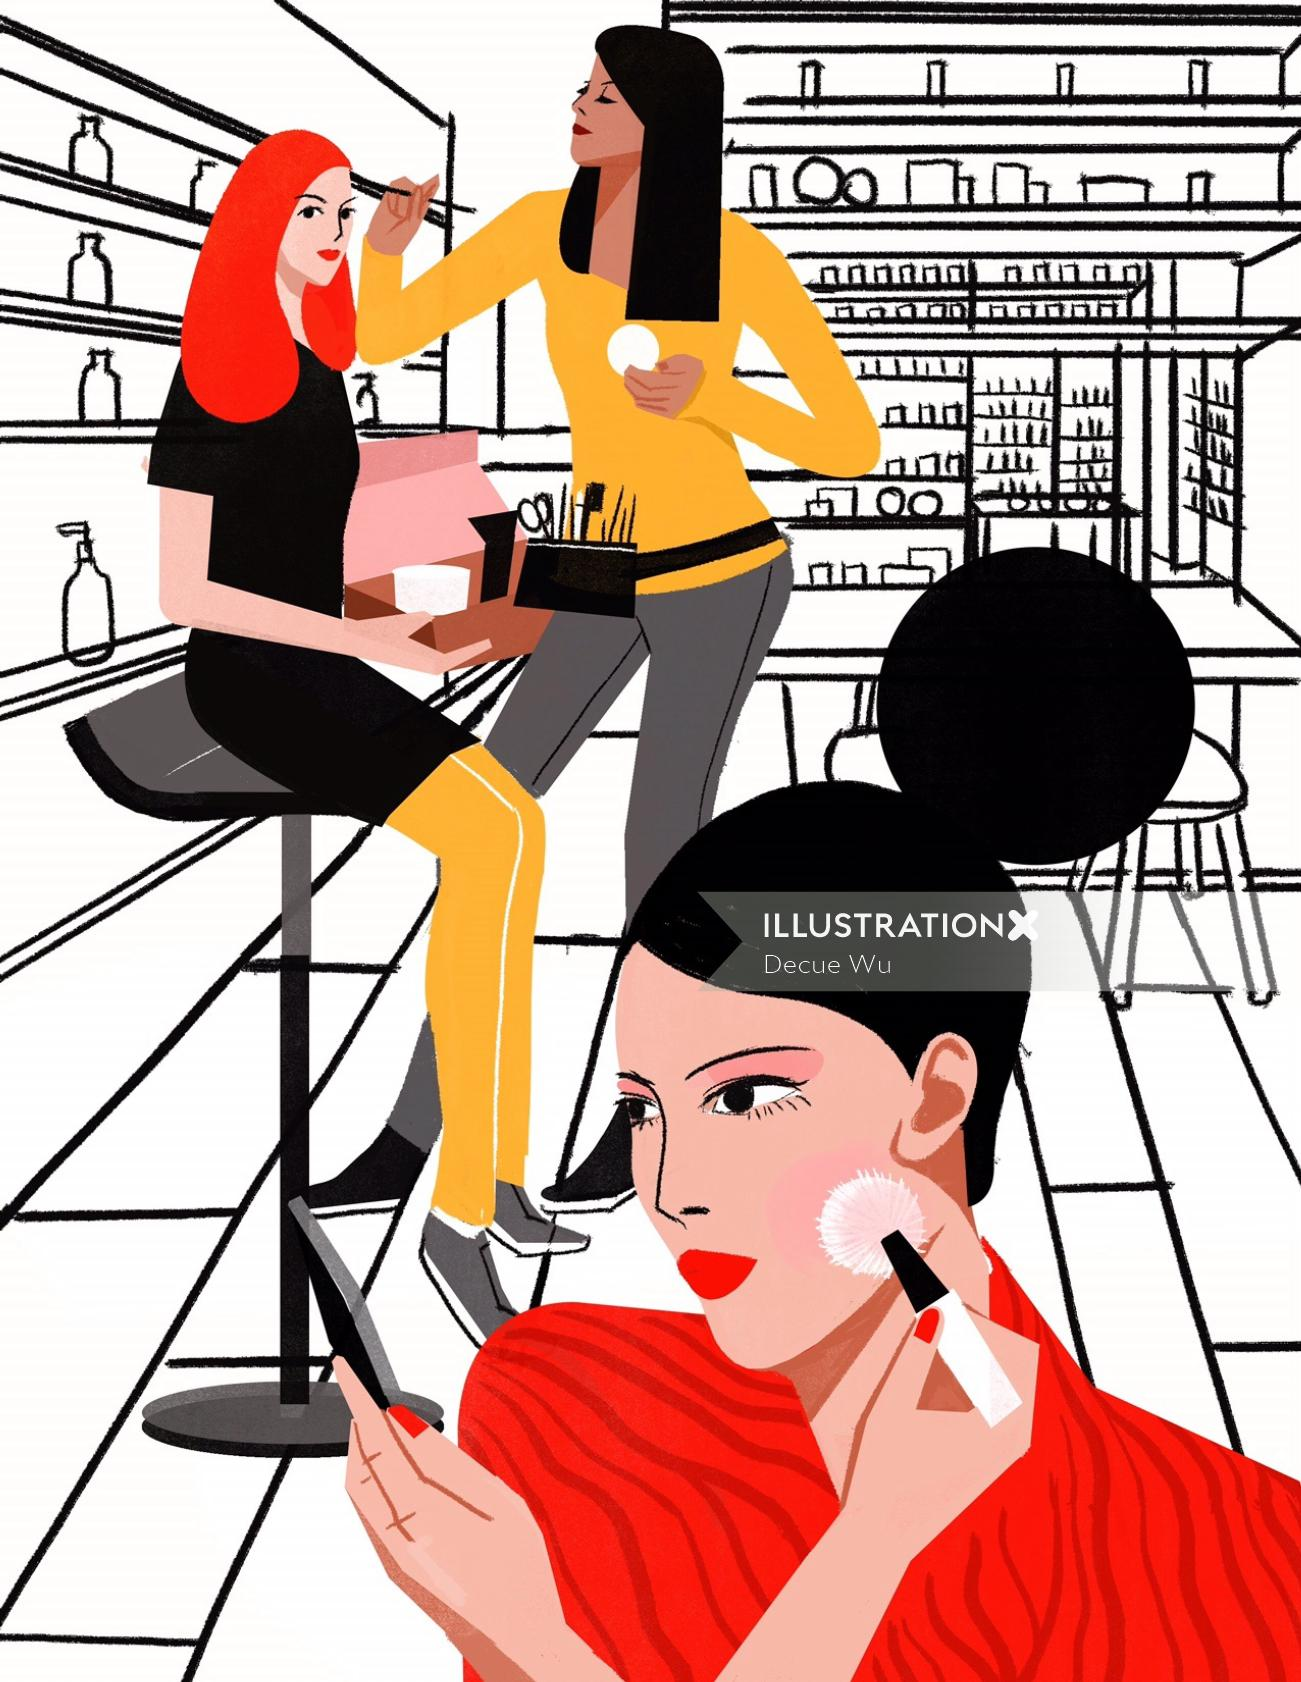 Line drawing of women applying makeup